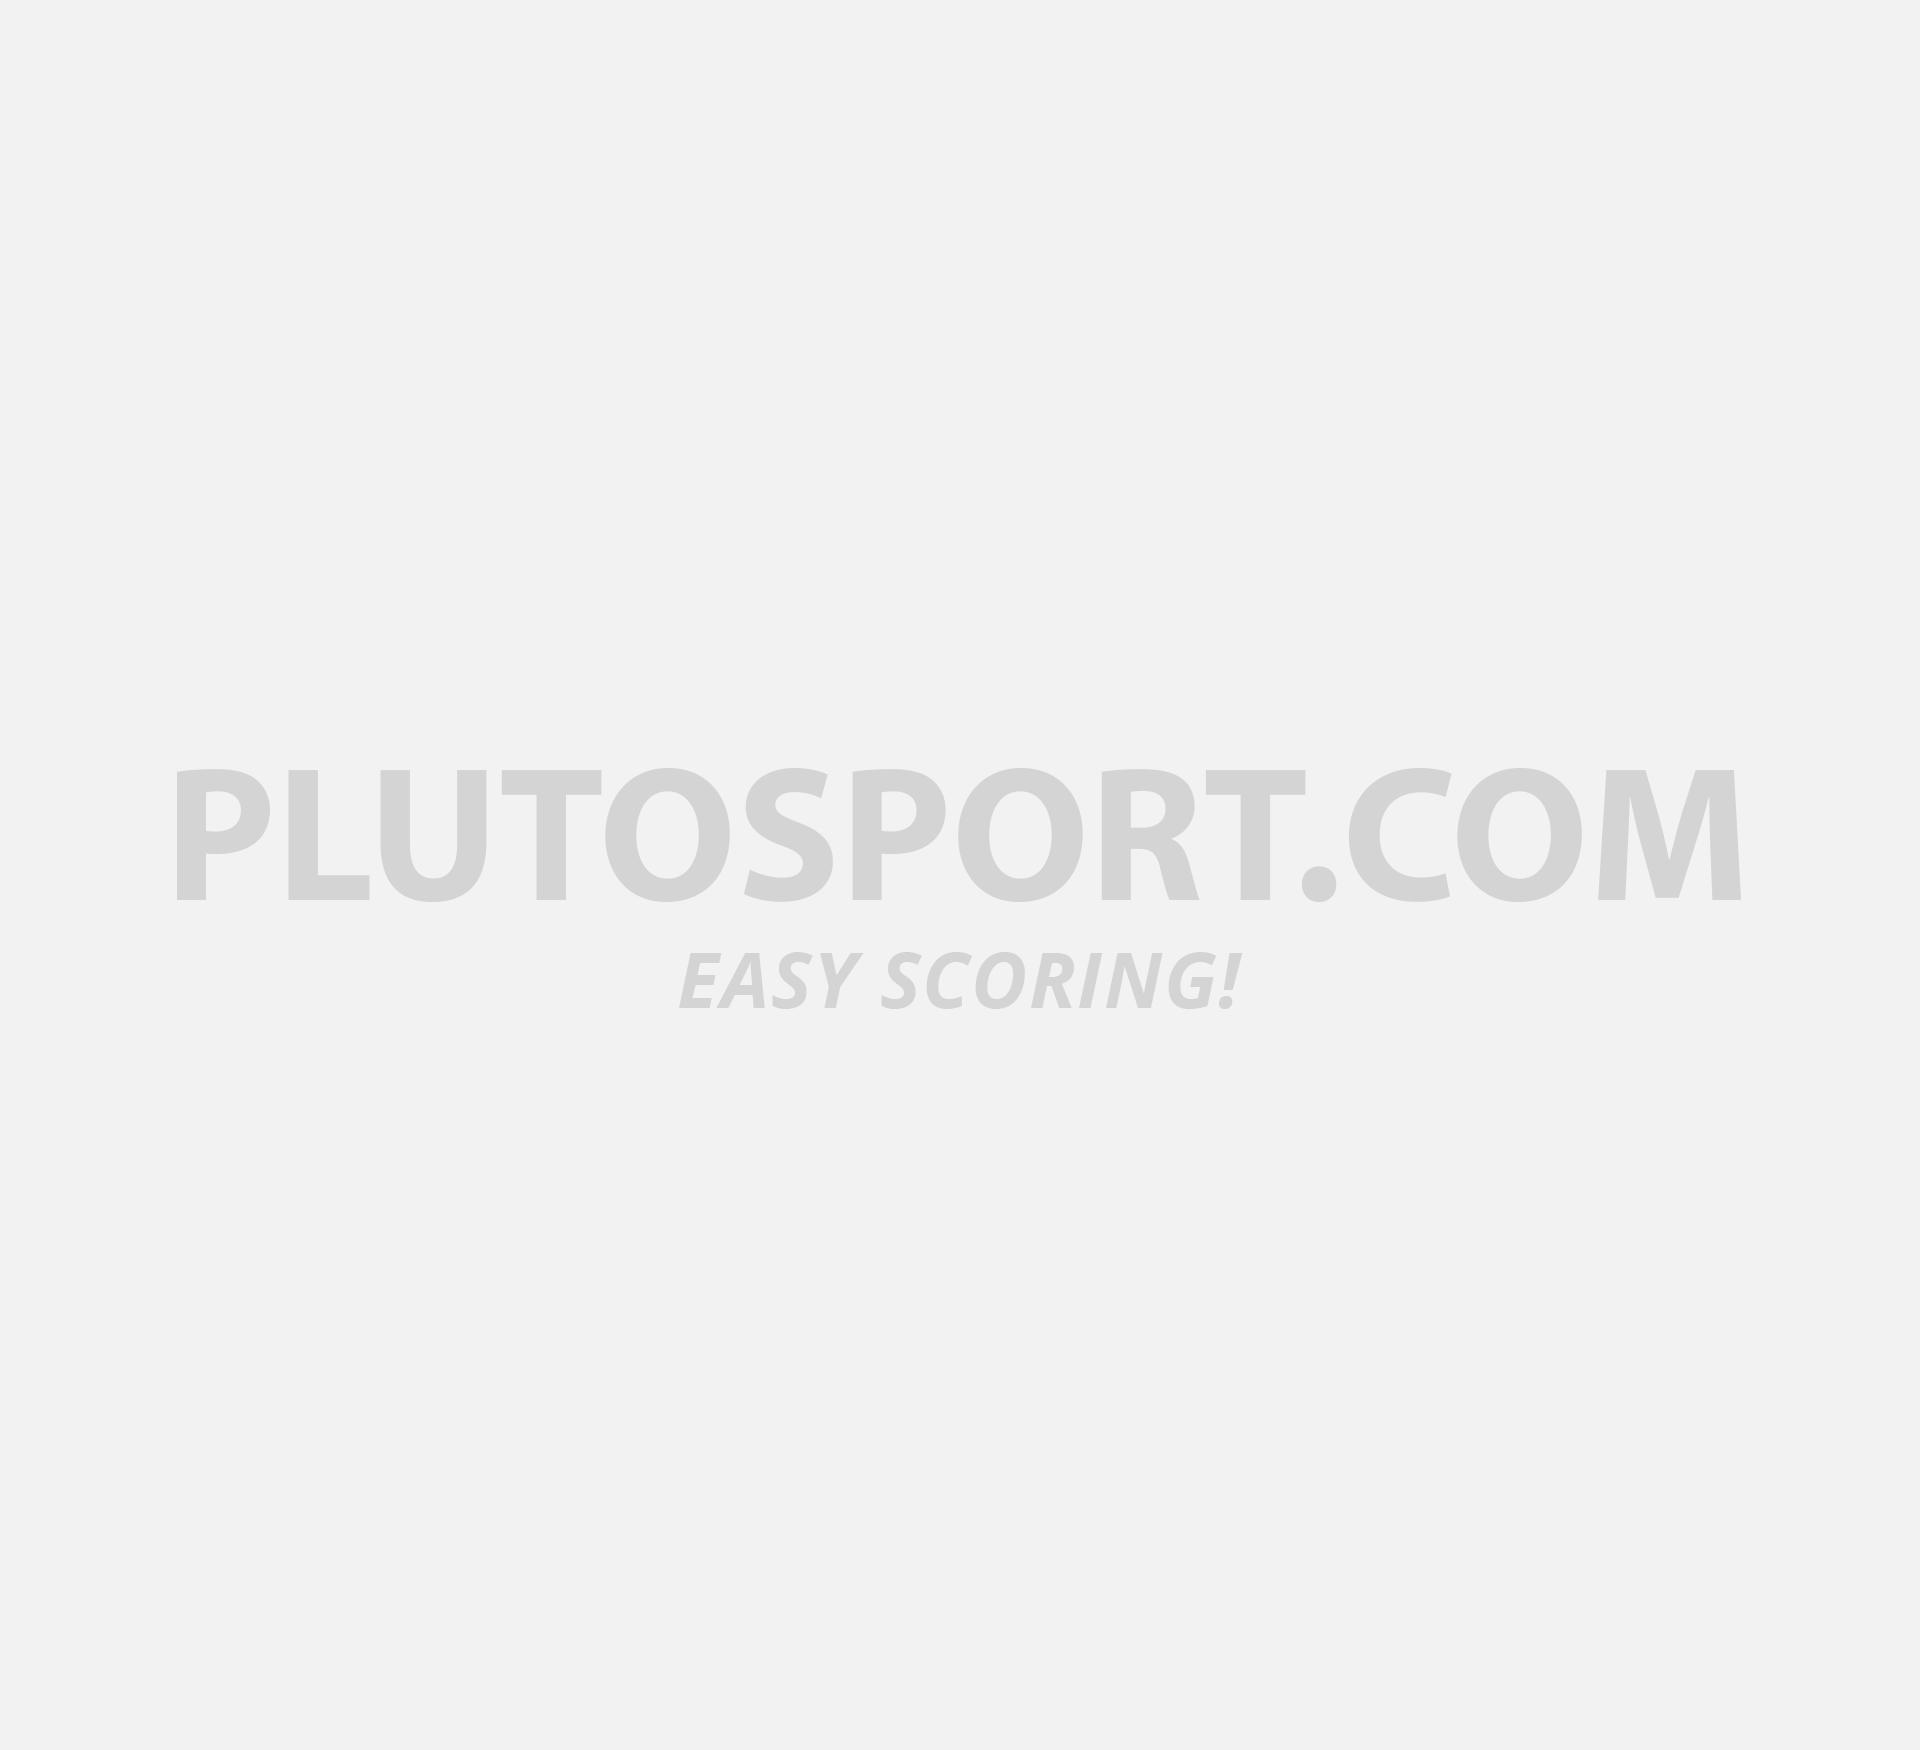 3737f836f80 Puma Carina L - Sneakers - Shoes - Lifestyle - Sports